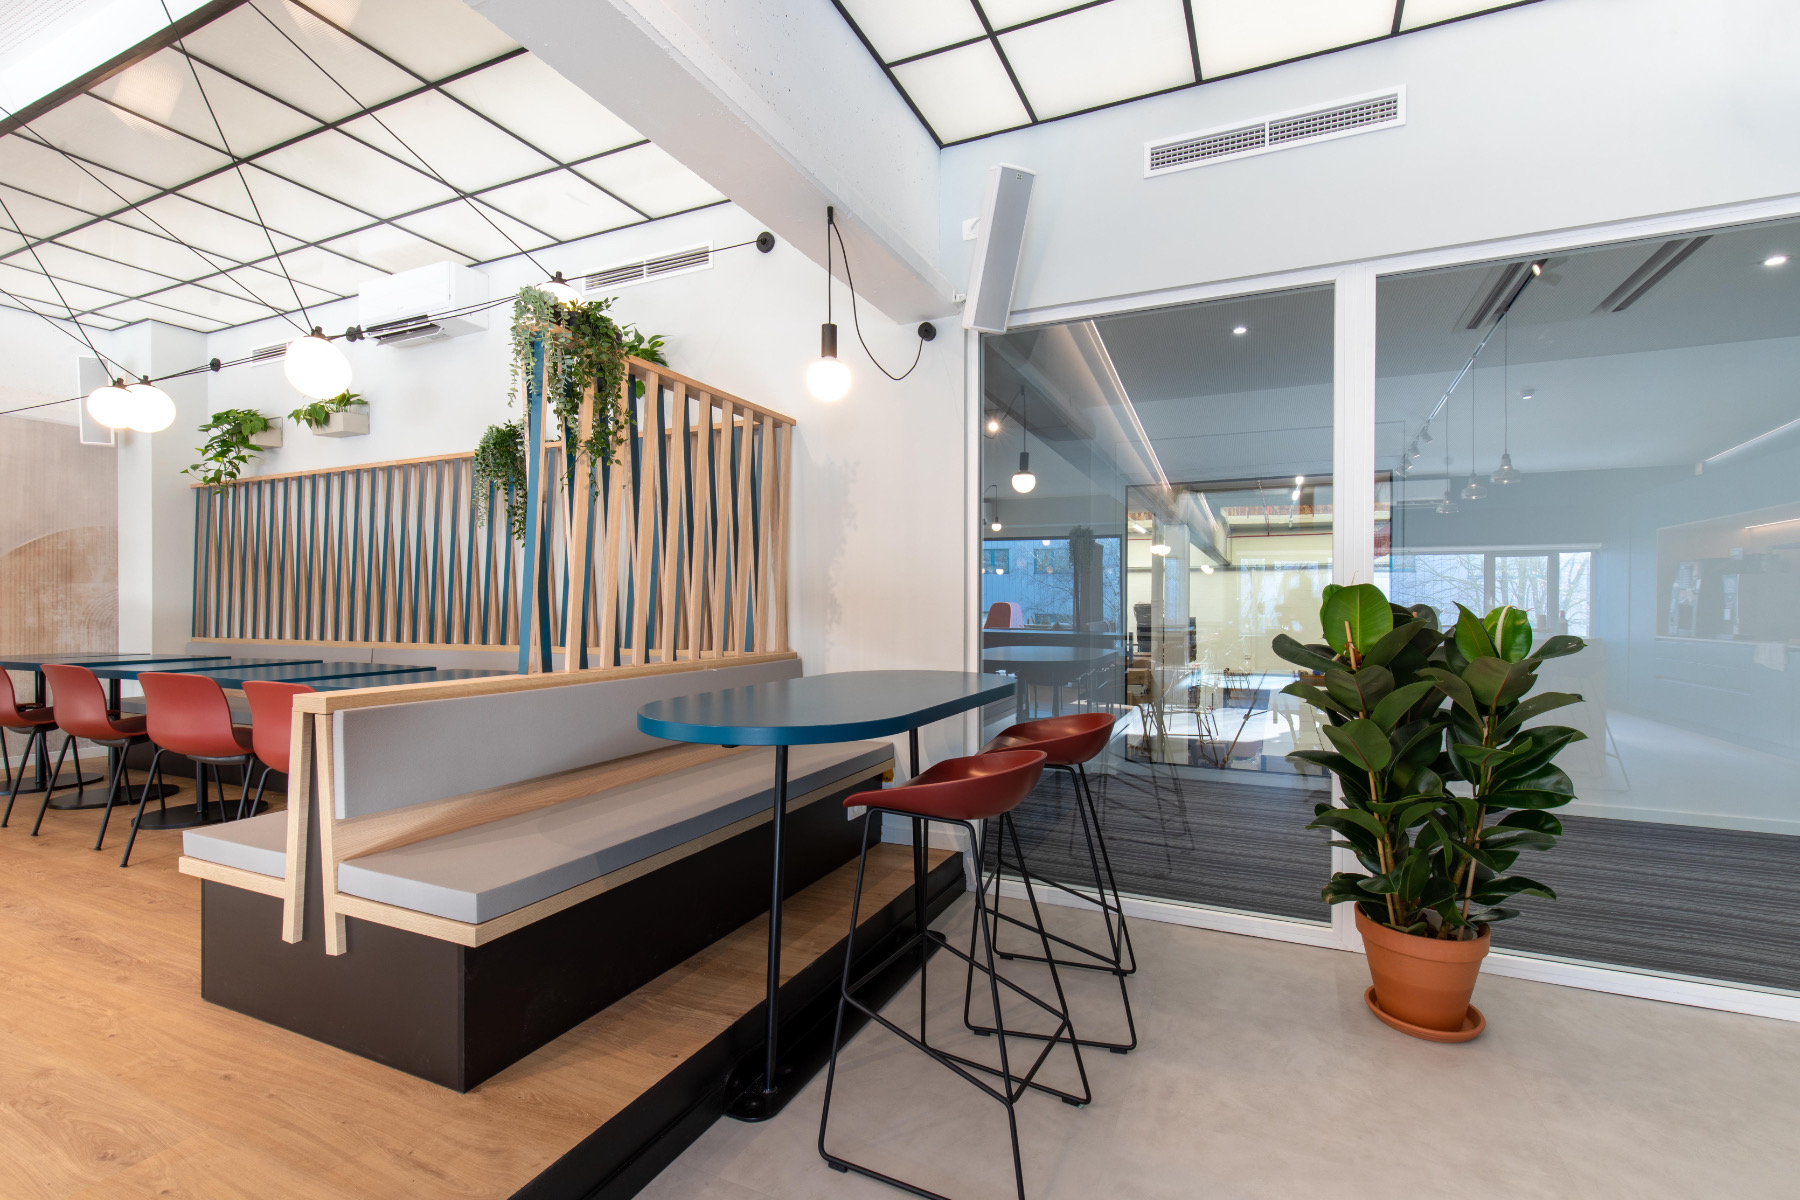 A Look Inside Bemac's New Liege Office